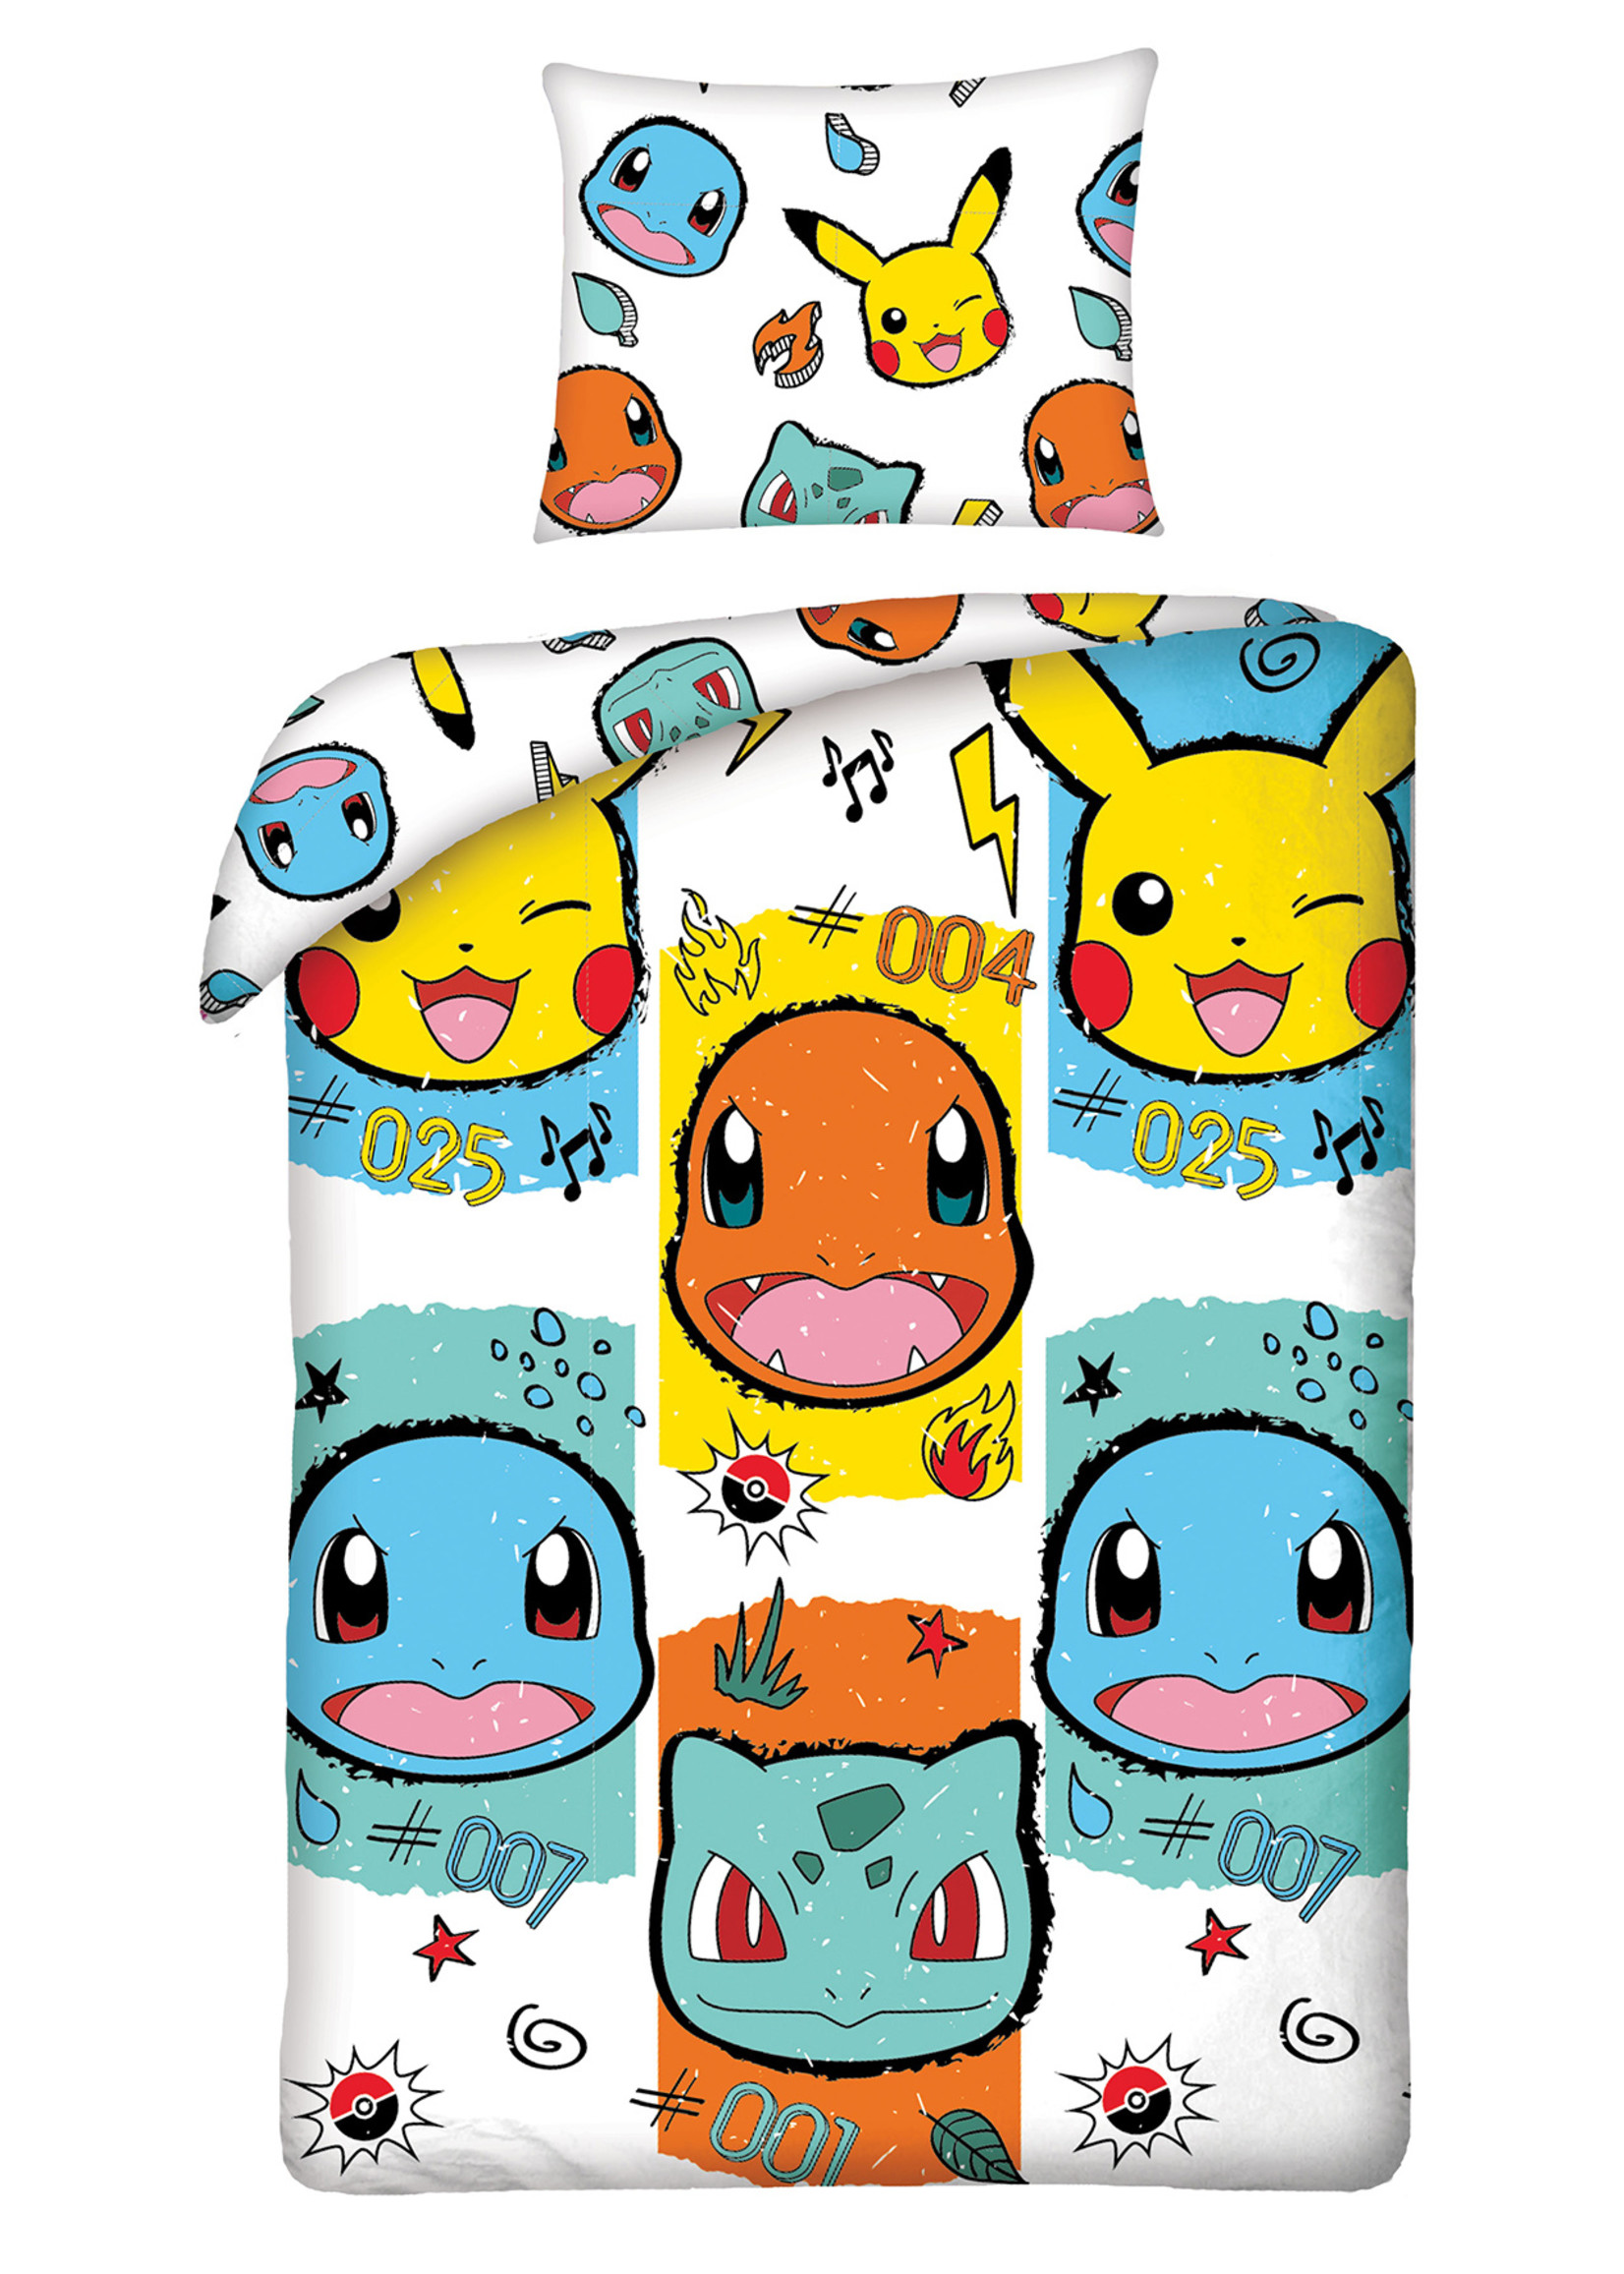 Pokémon Pokemon Duvet Cover Set - Copy - Copy